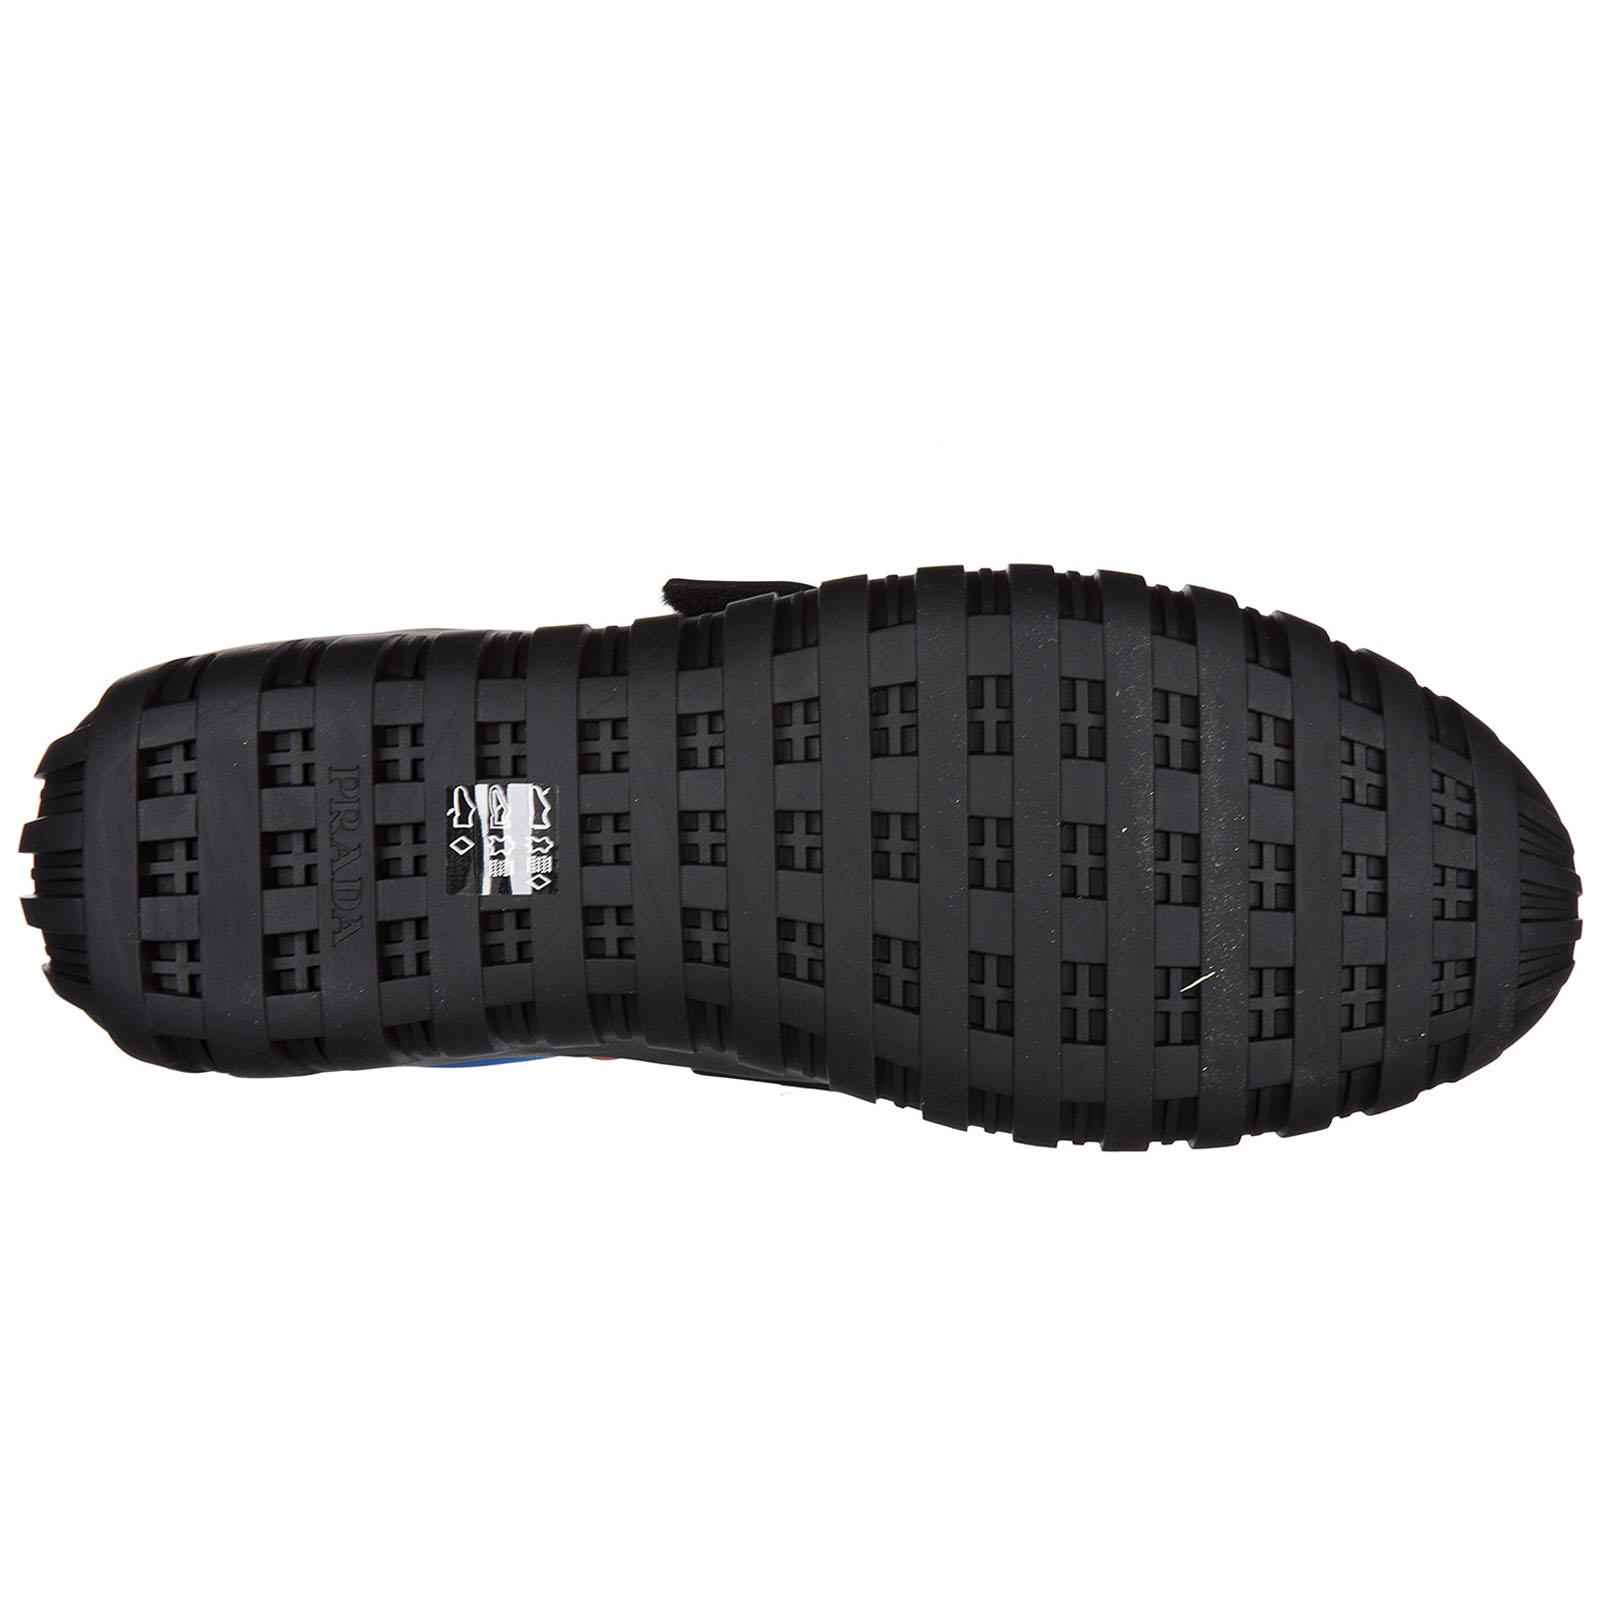 Zapatos zapatillas de deporte hombres en nylon nylon1